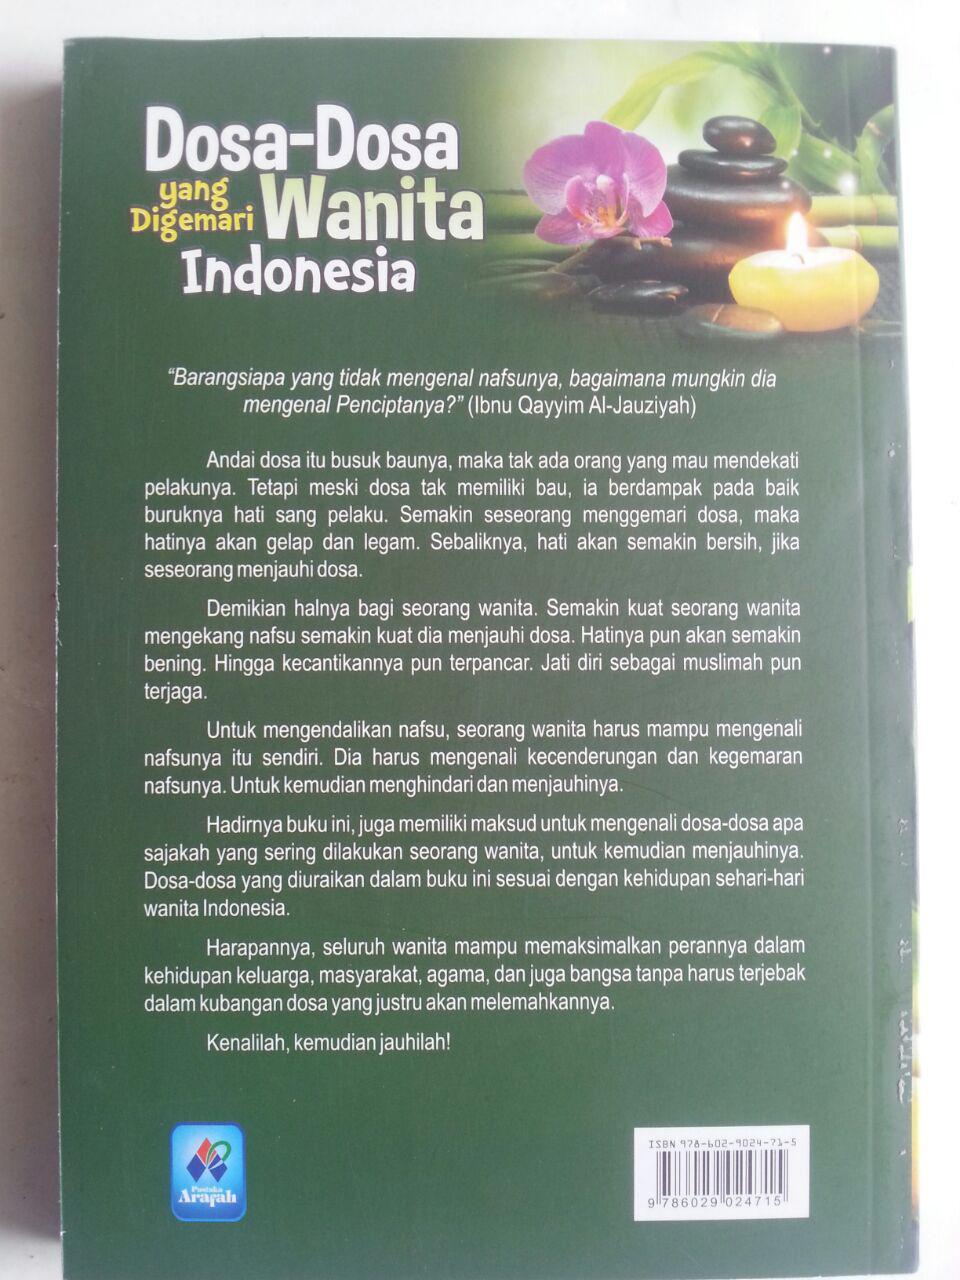 Buku Dosa-Dosa Yang Digemari Wanita Indonesia cover